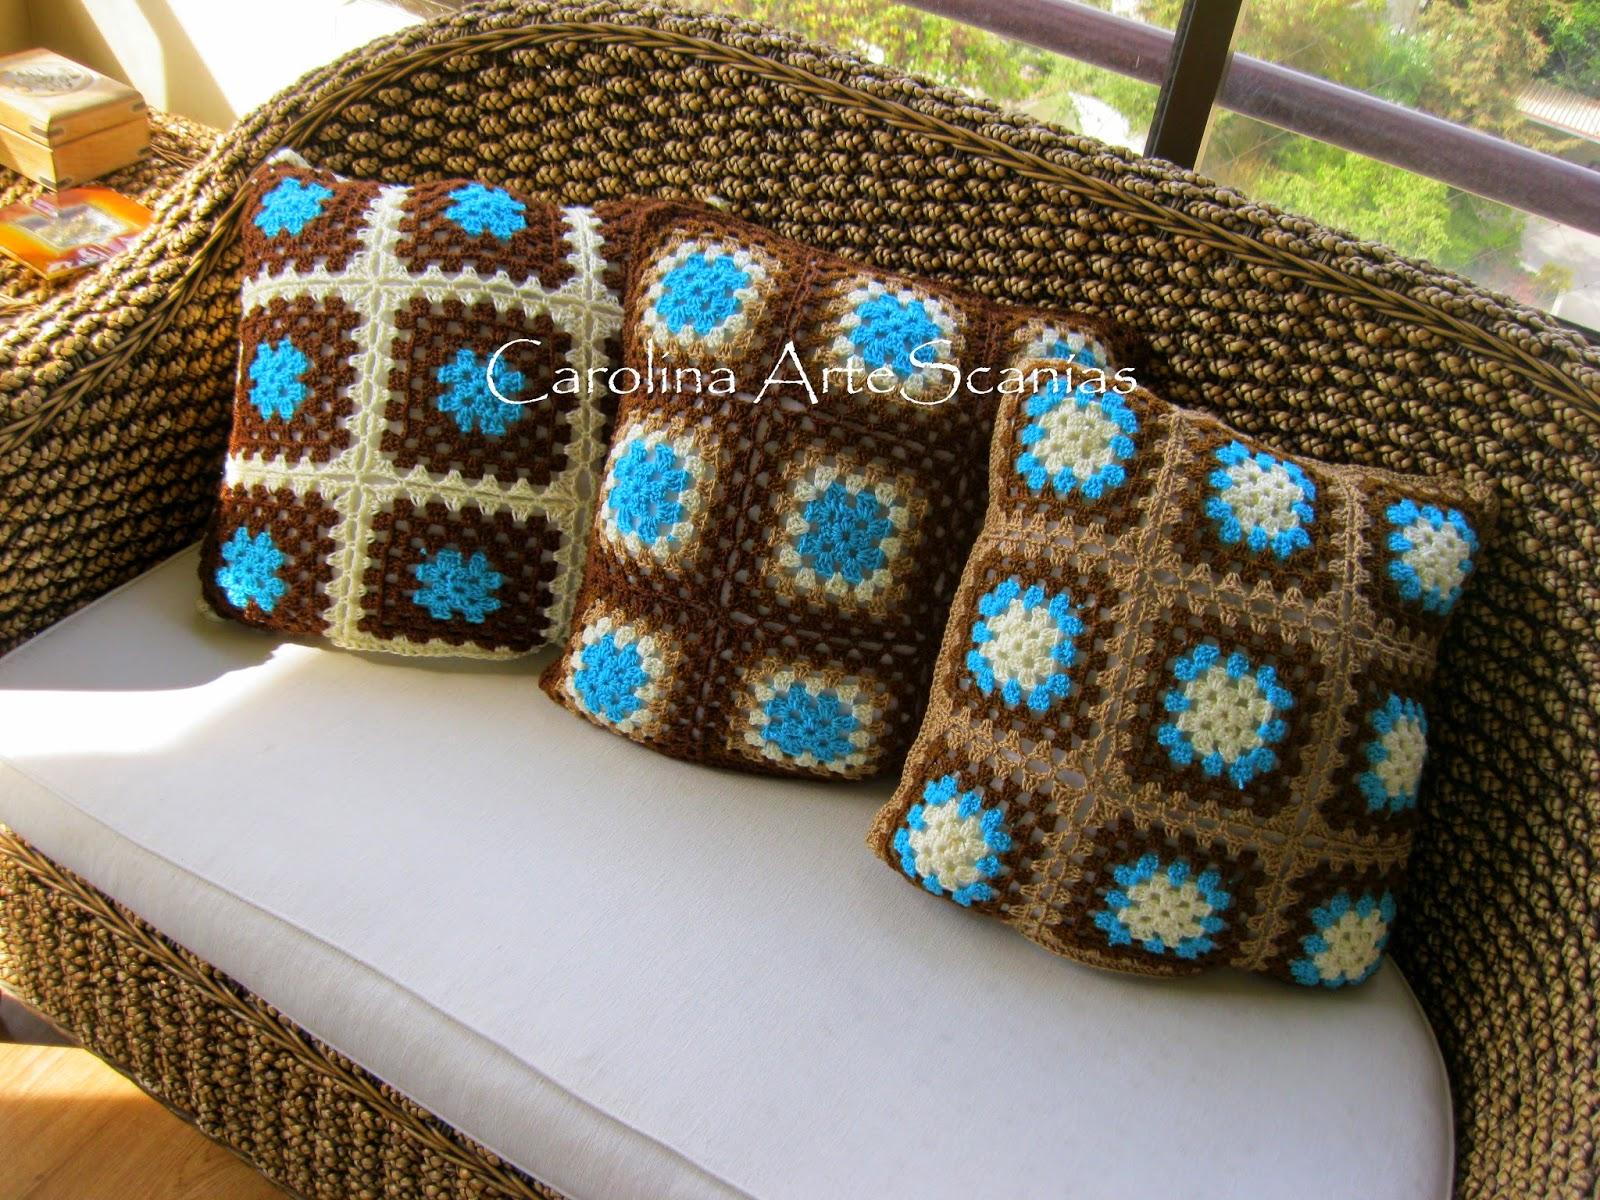 Vitrina de carolina artesan as la tienda 233 cojines crochet grannys magdalena - Cojines de lana ...